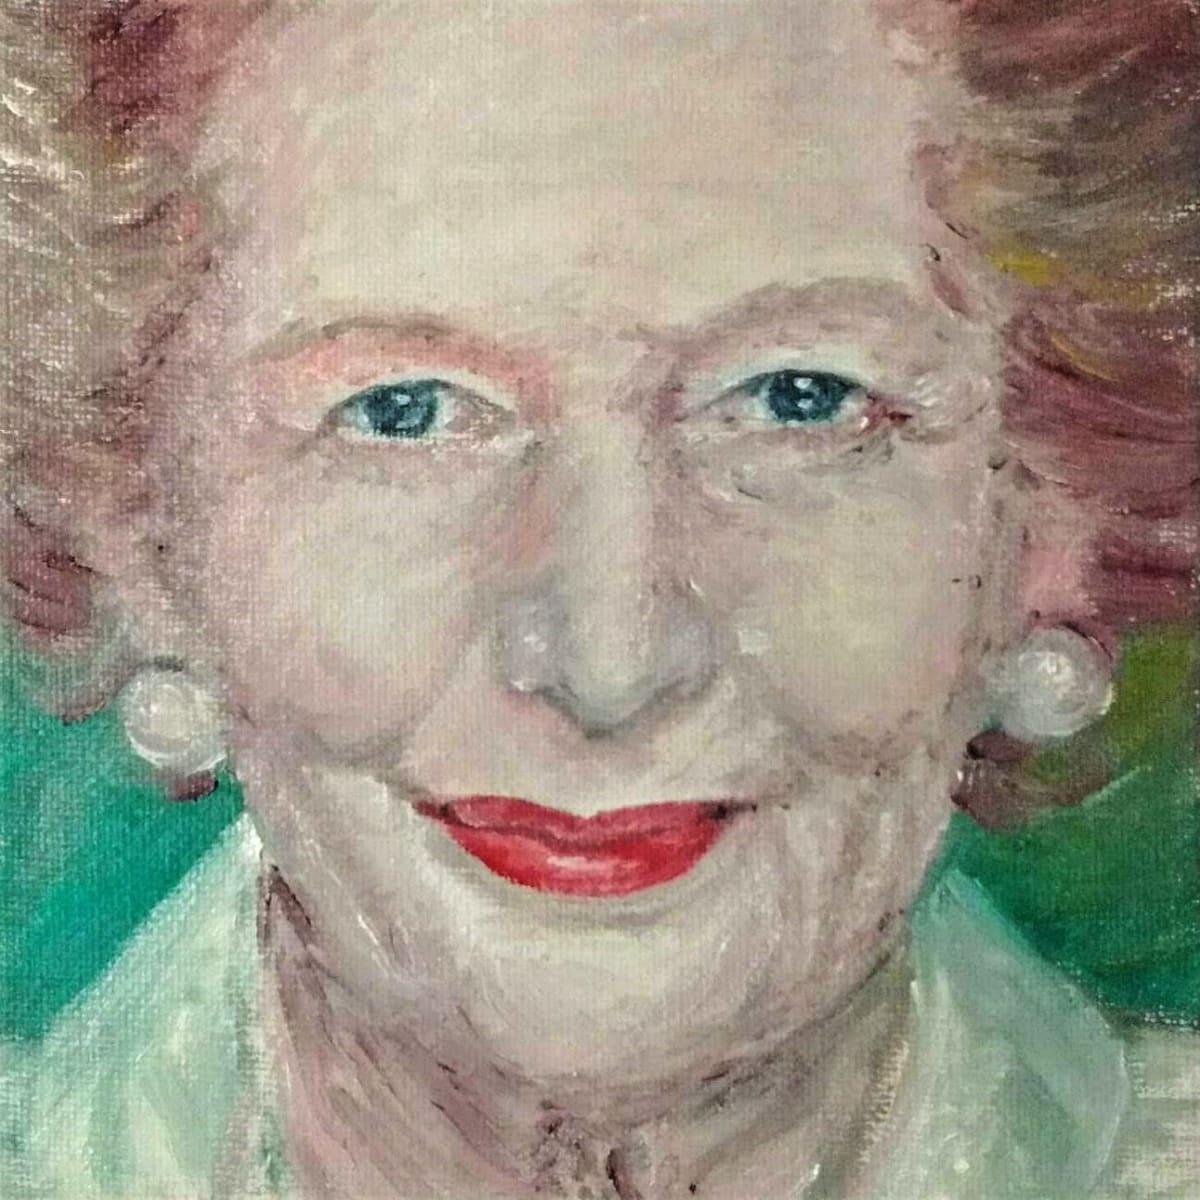 Margaret Thatcher by Jill Cooper